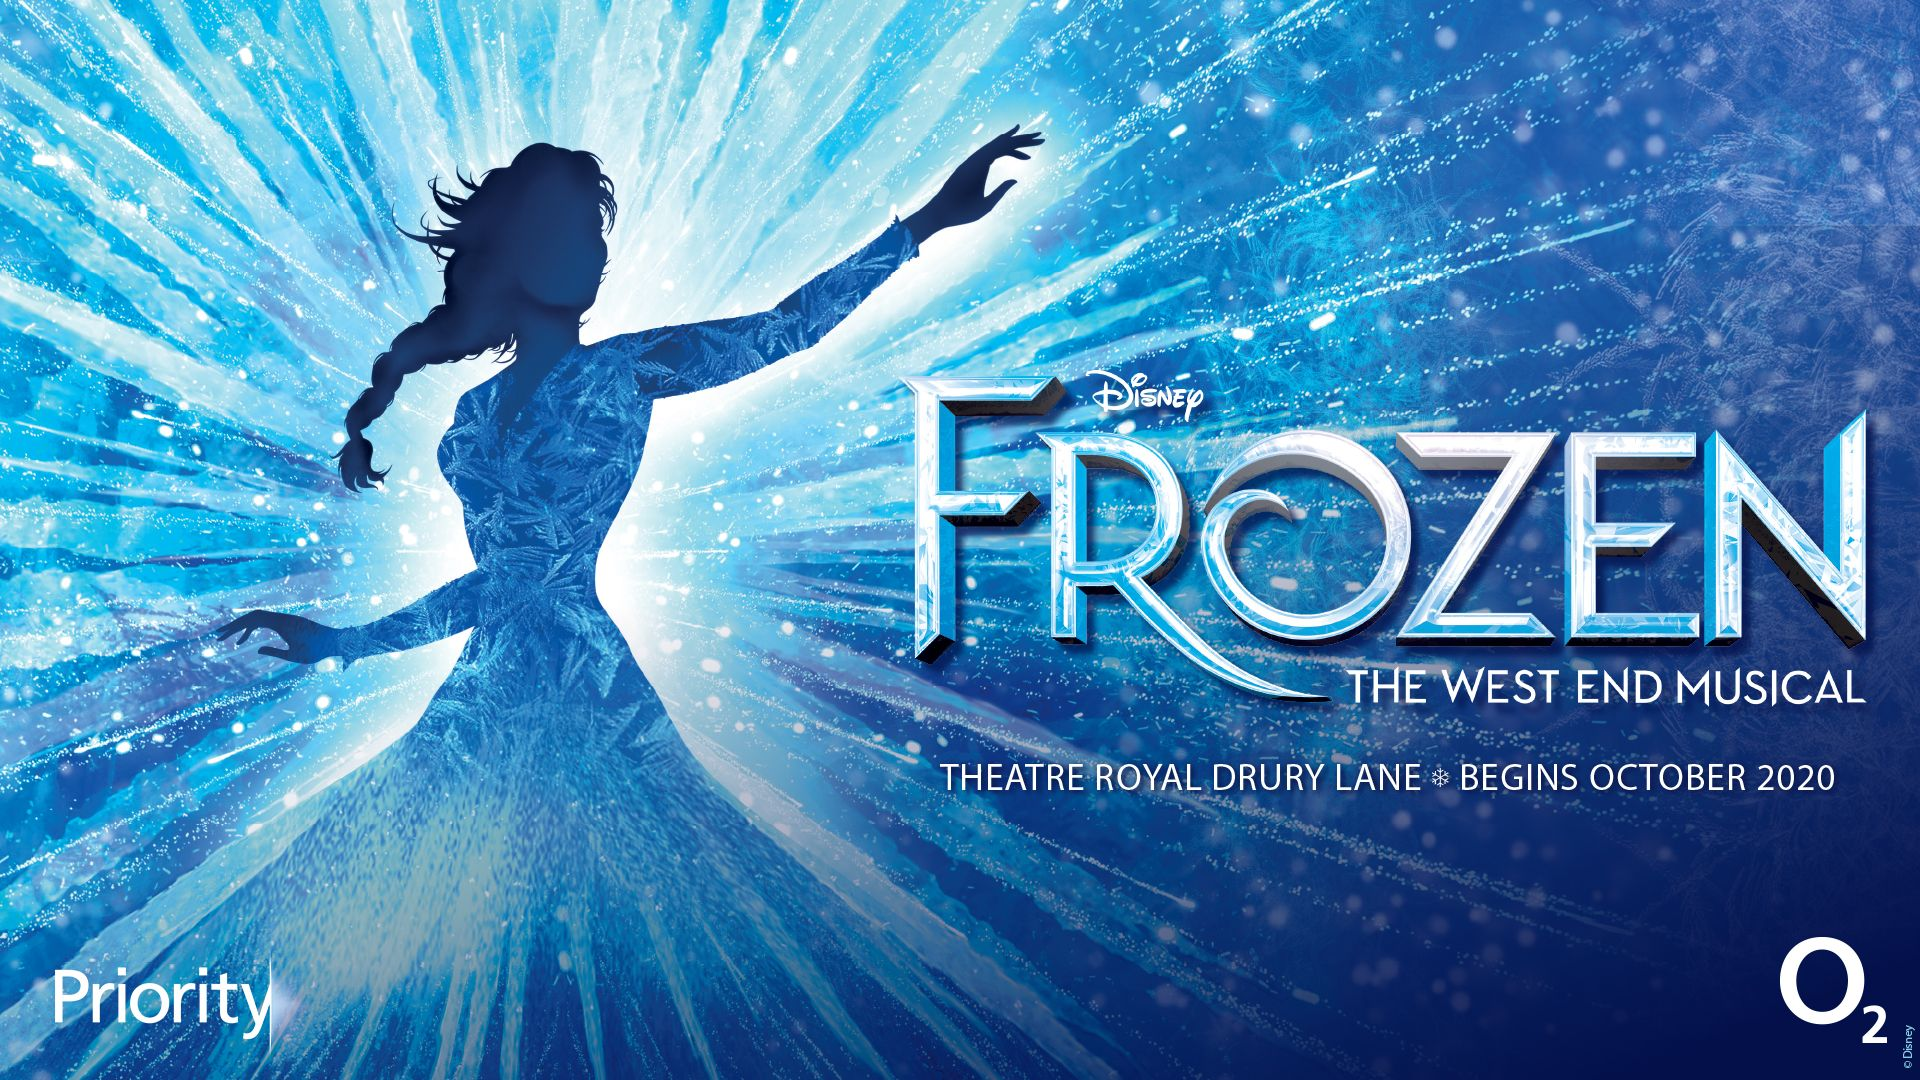 Frozen-Social-16x9.jpg